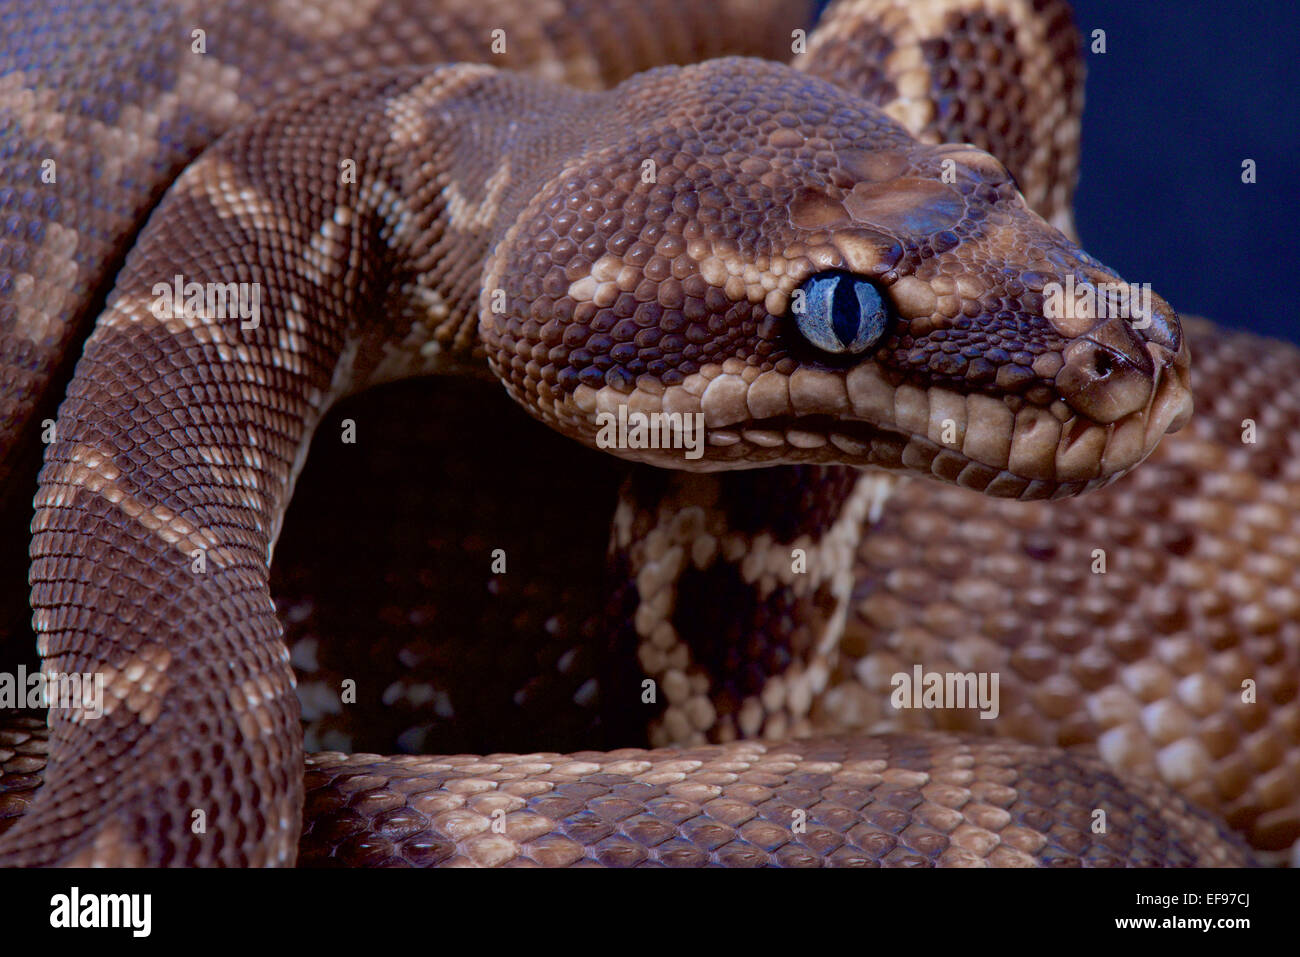 Rough-scaled python / Morelia carinata - Stock Image